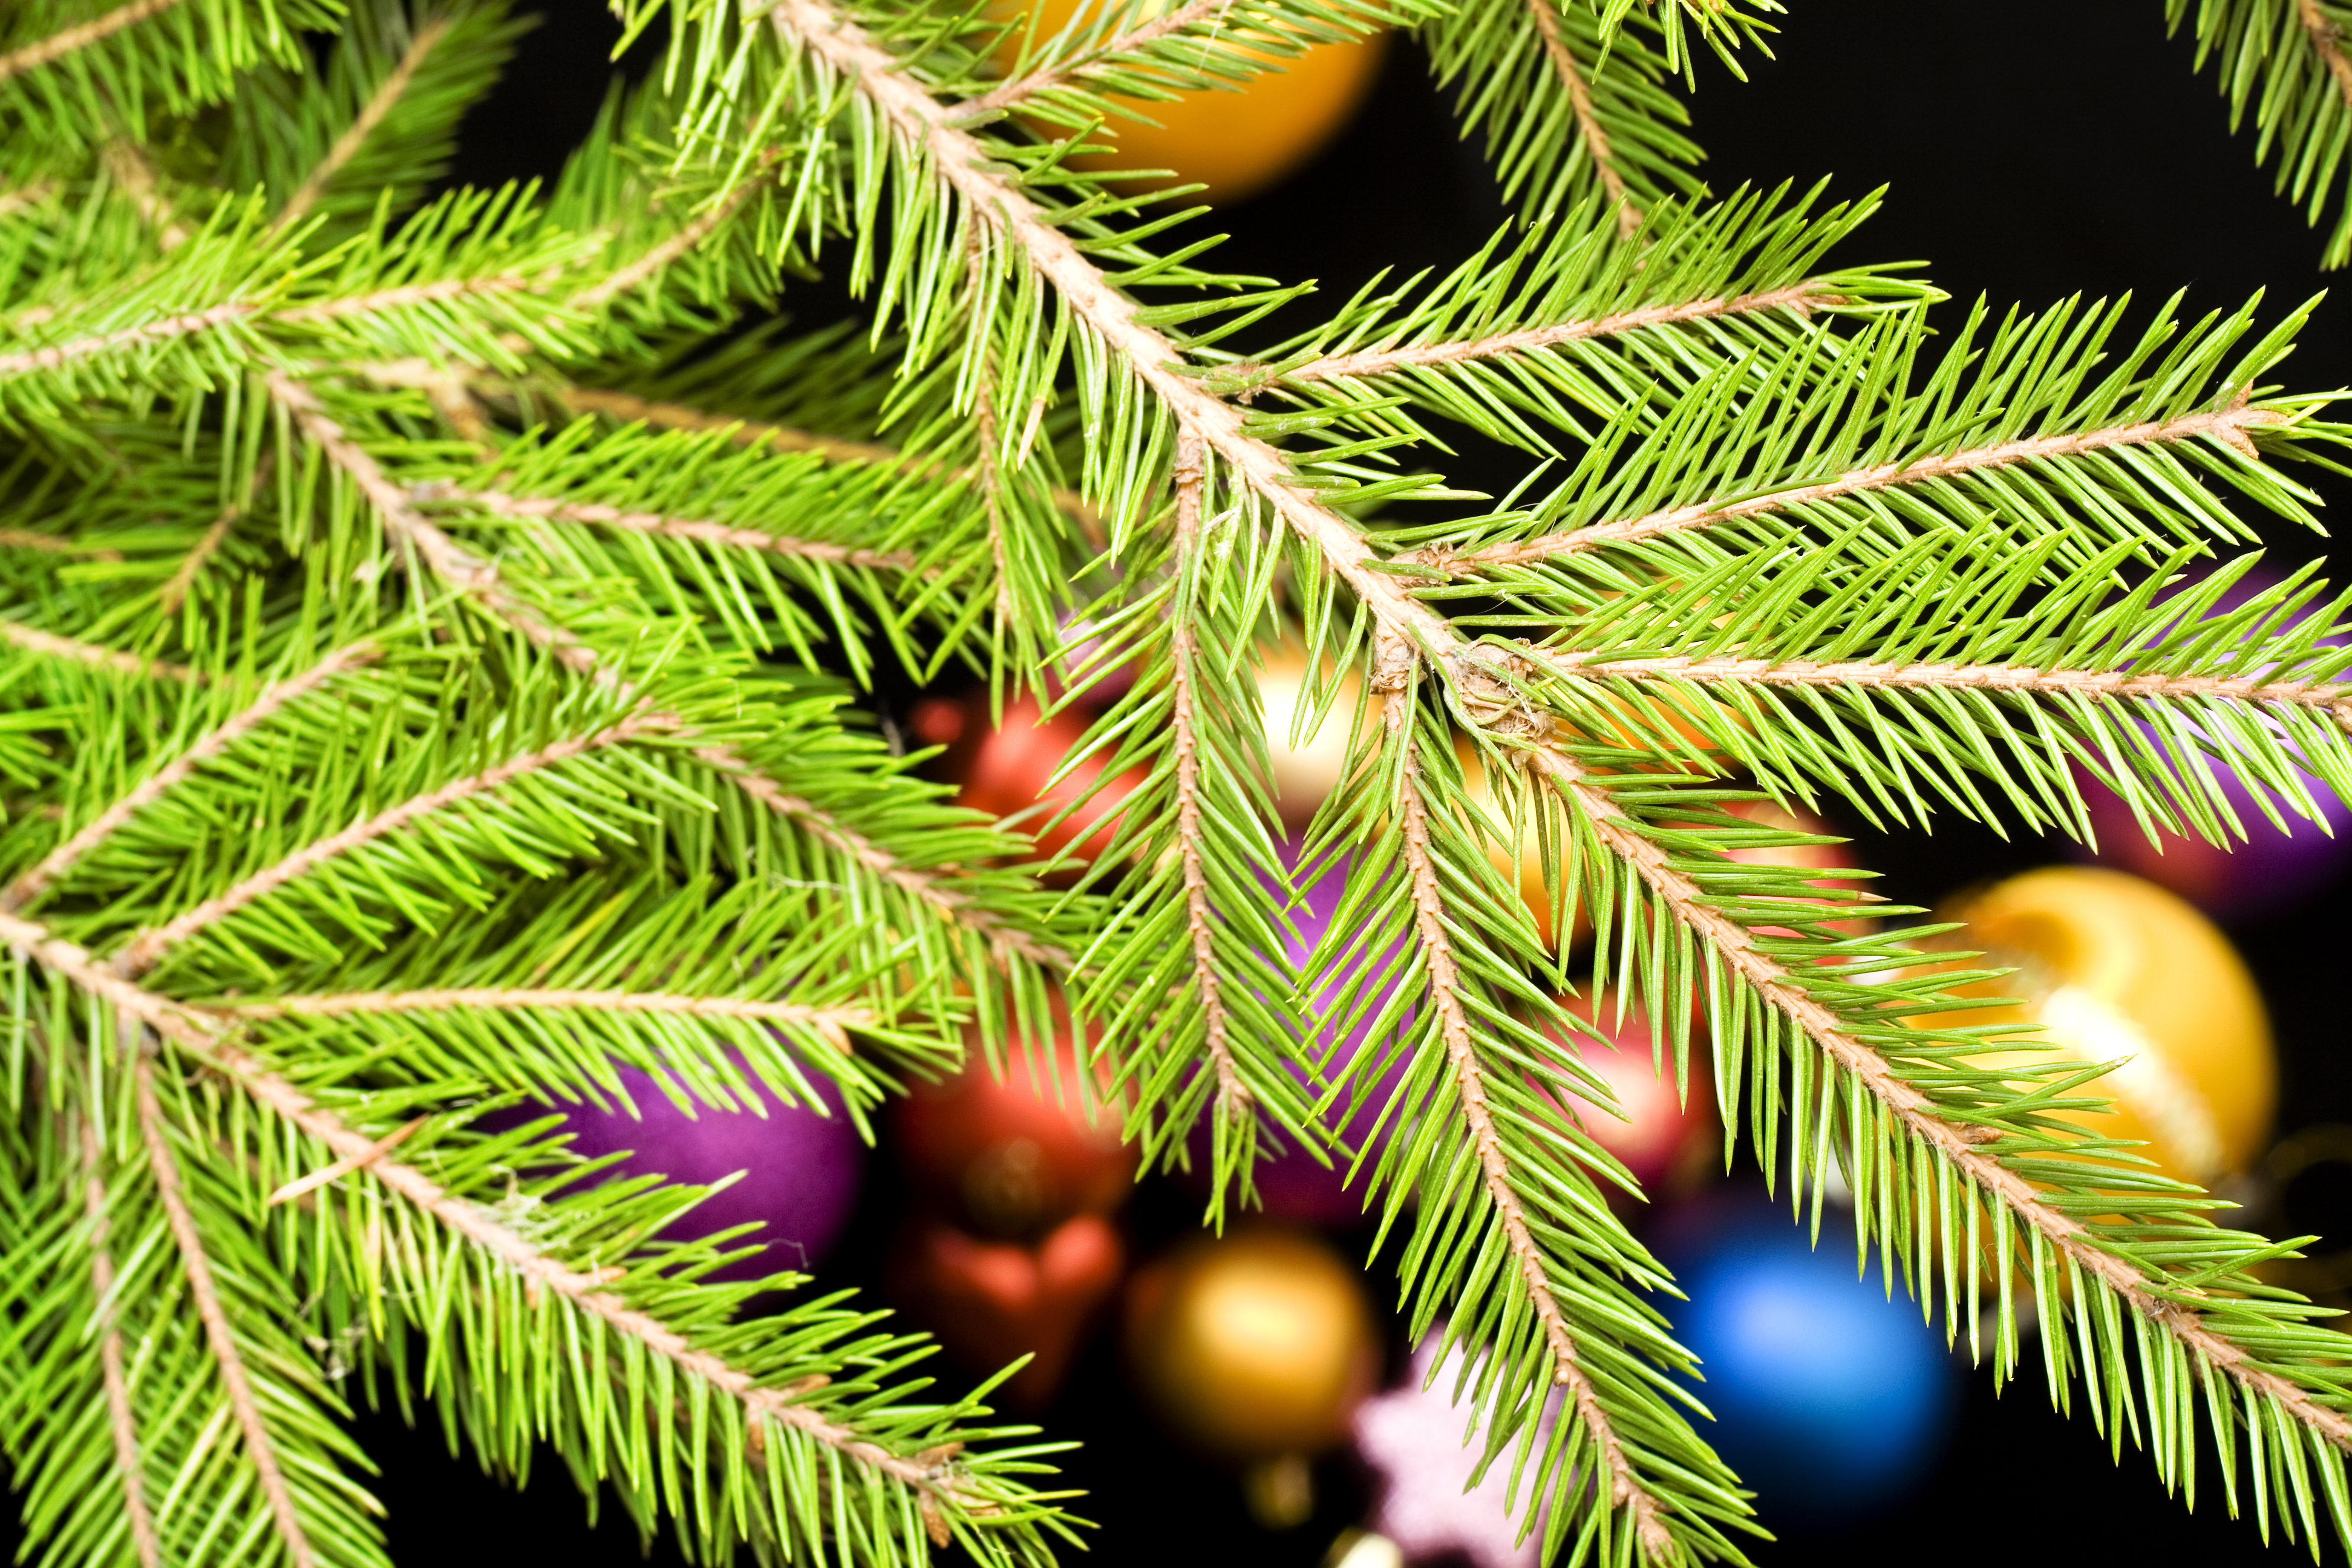 christmas balls, Ball, Group, White, Vibrant, HQ Photo